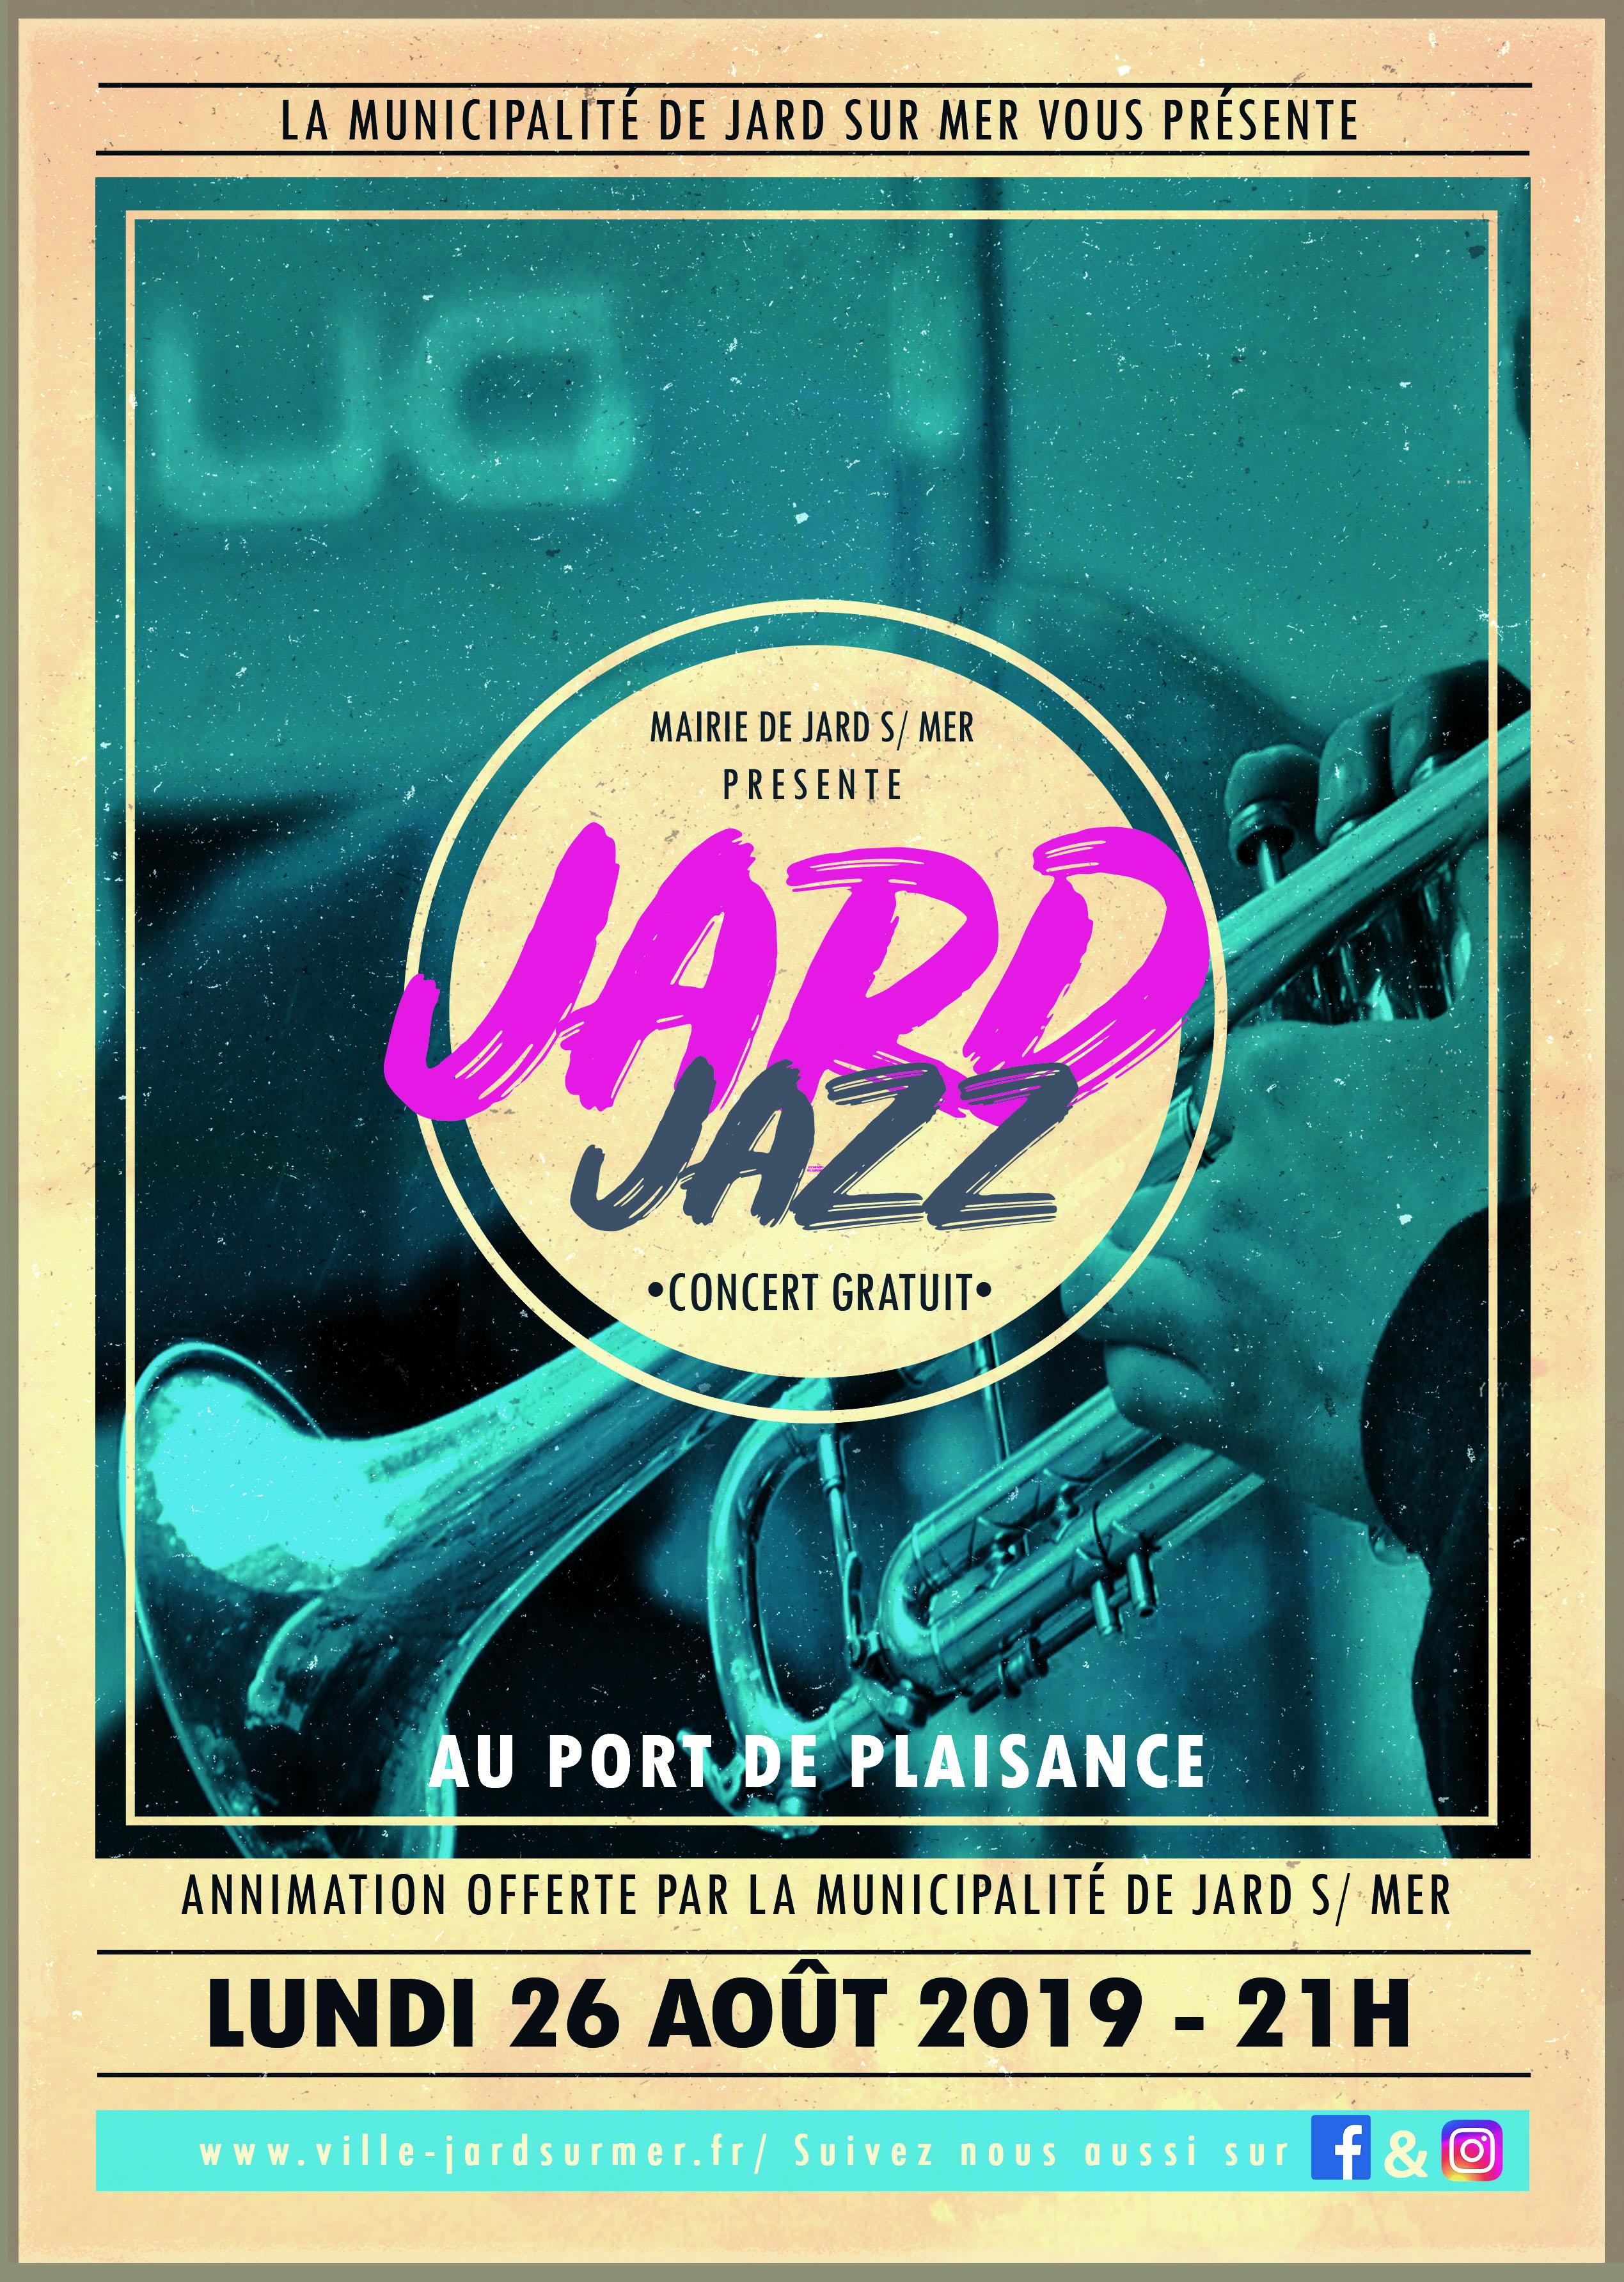 08.26 Jard jazz